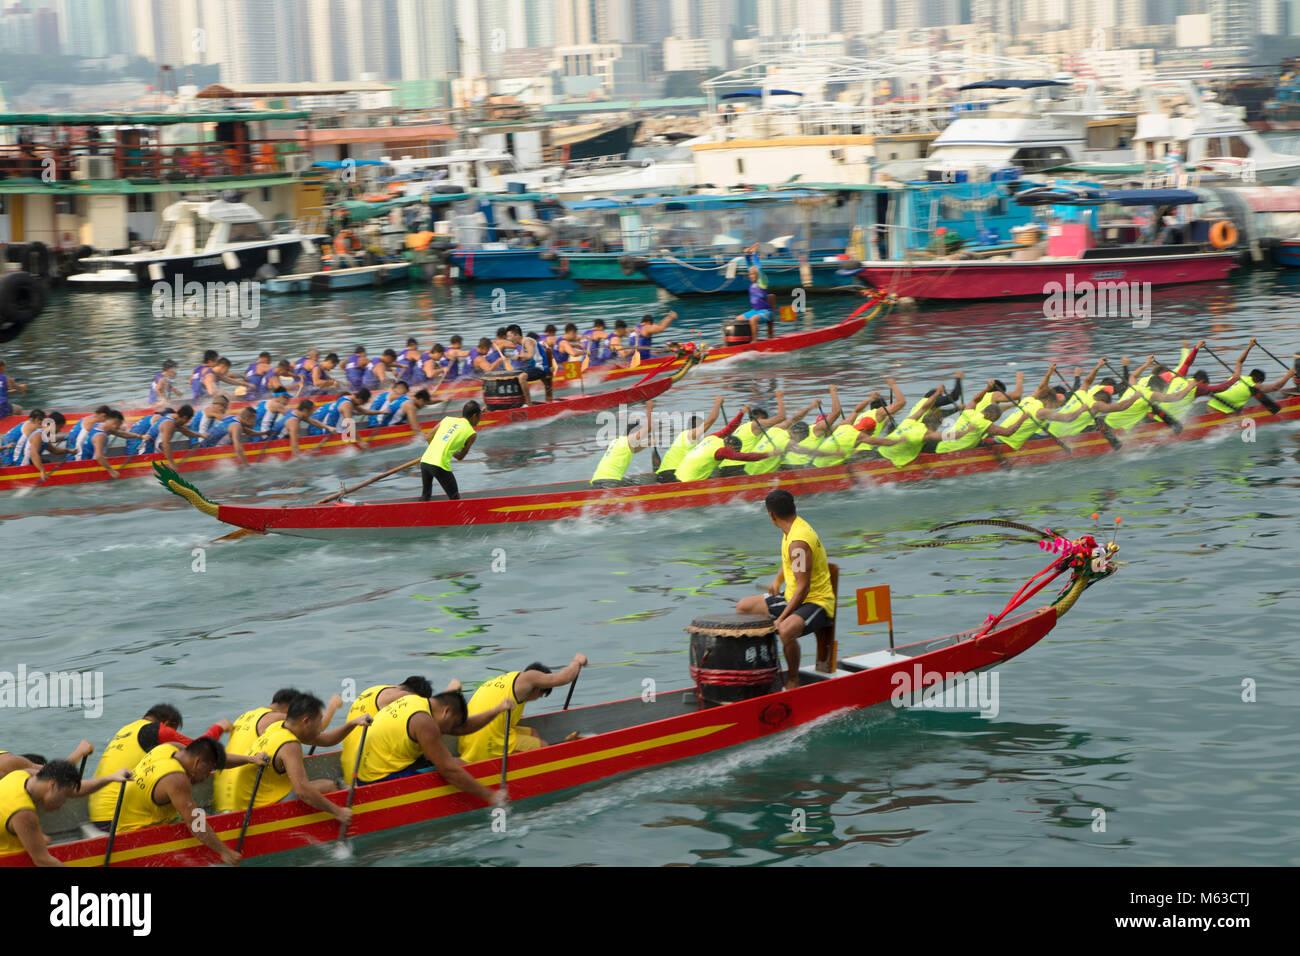 Dragon boat race, Shau Kei Wan, Hong Kong Island, Hong Kong, China - Stock Image